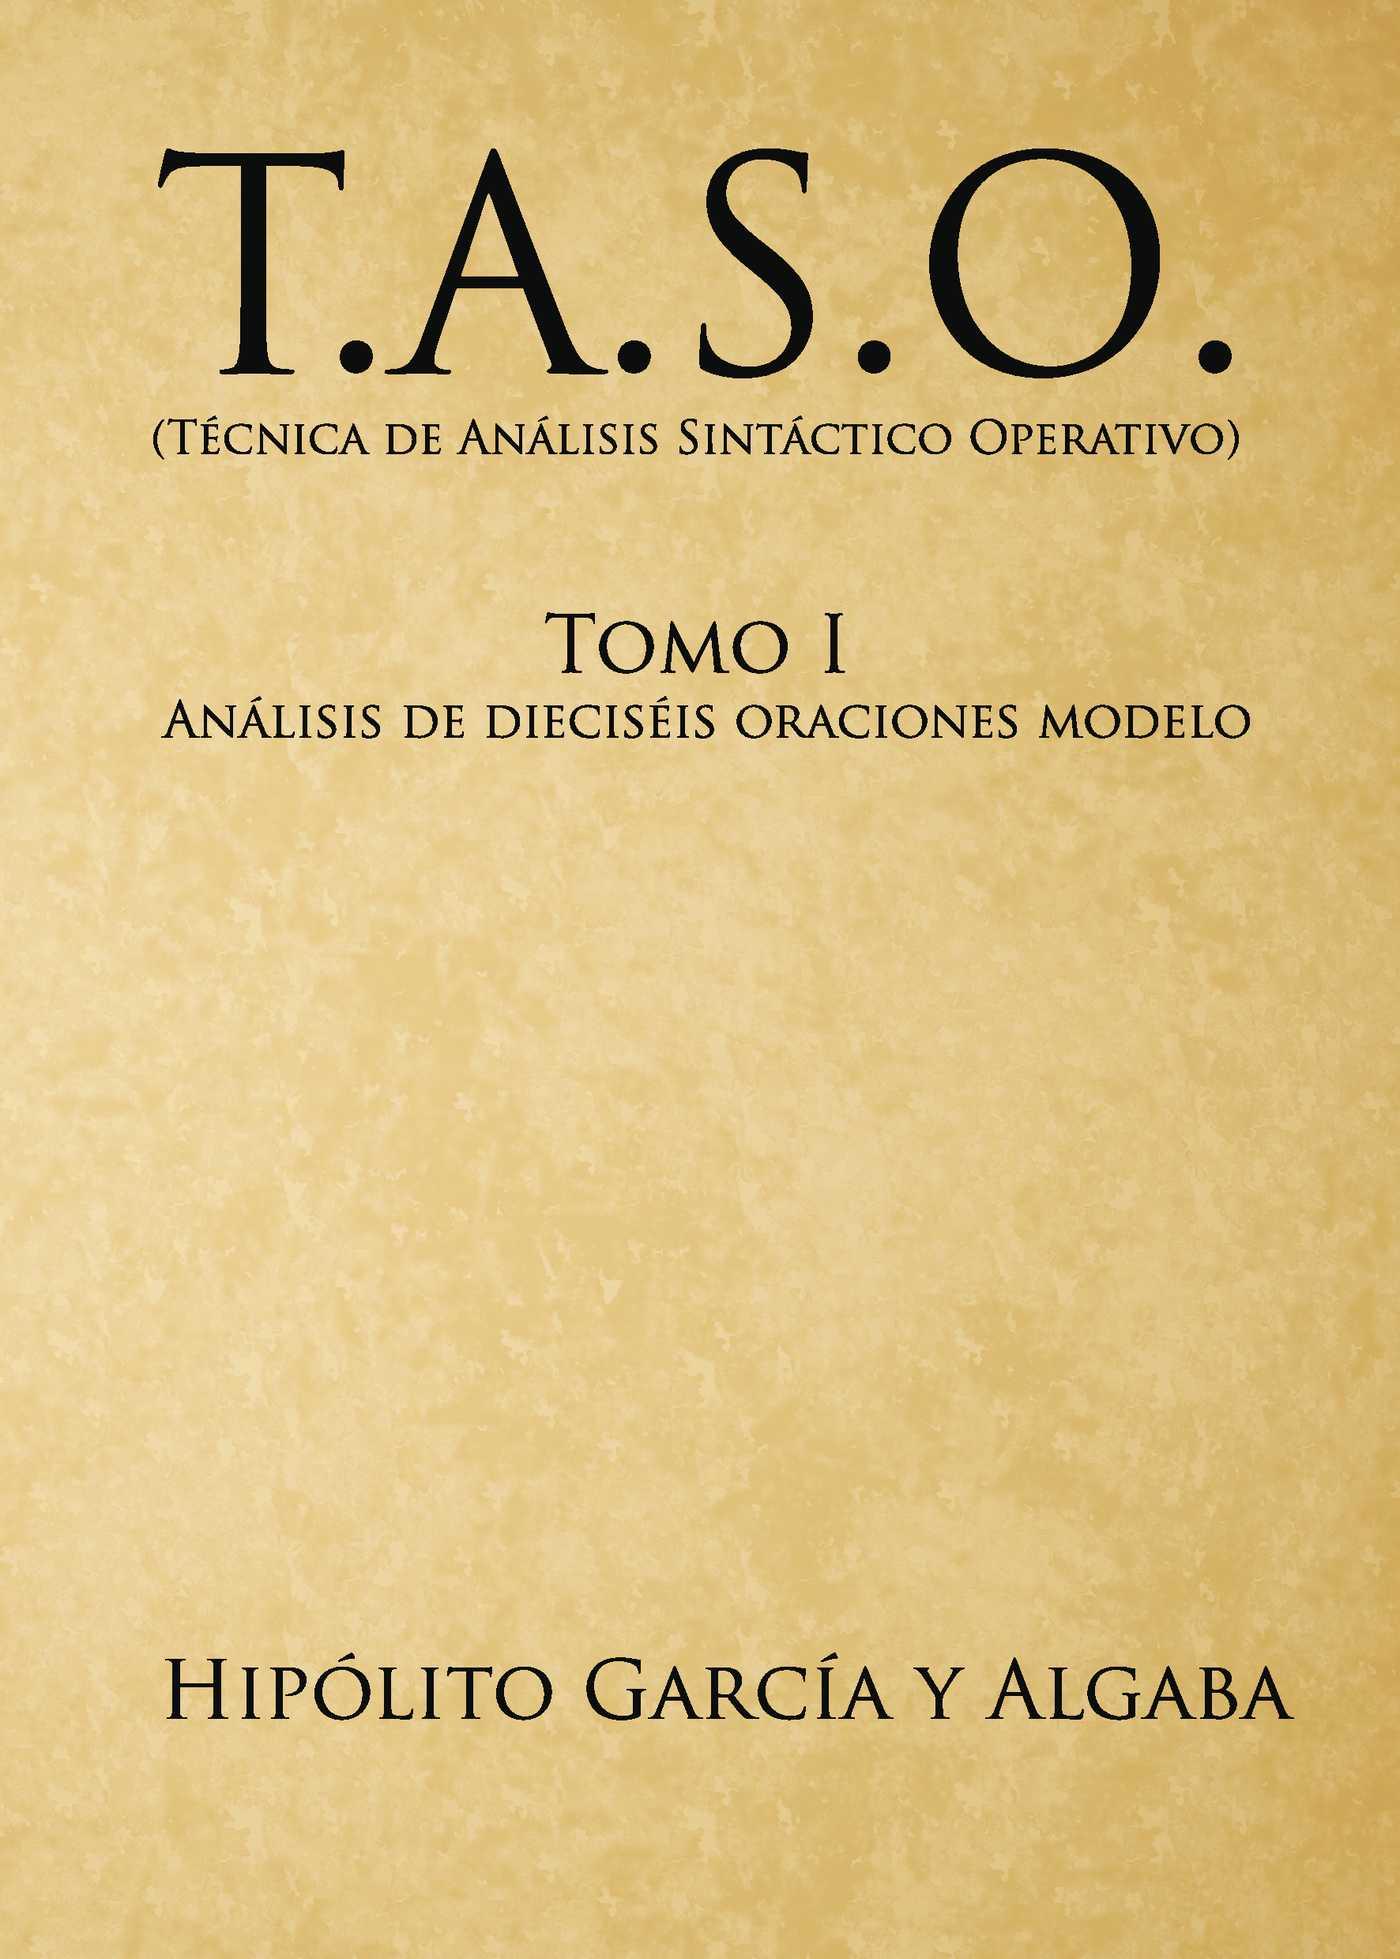 Descargar T A S O  (TECNICA DE ANALISIS SINTACTICO OPERATIVO) TOMO 1: ANALISIS DE DIECISEIS ORACIONES MODELO